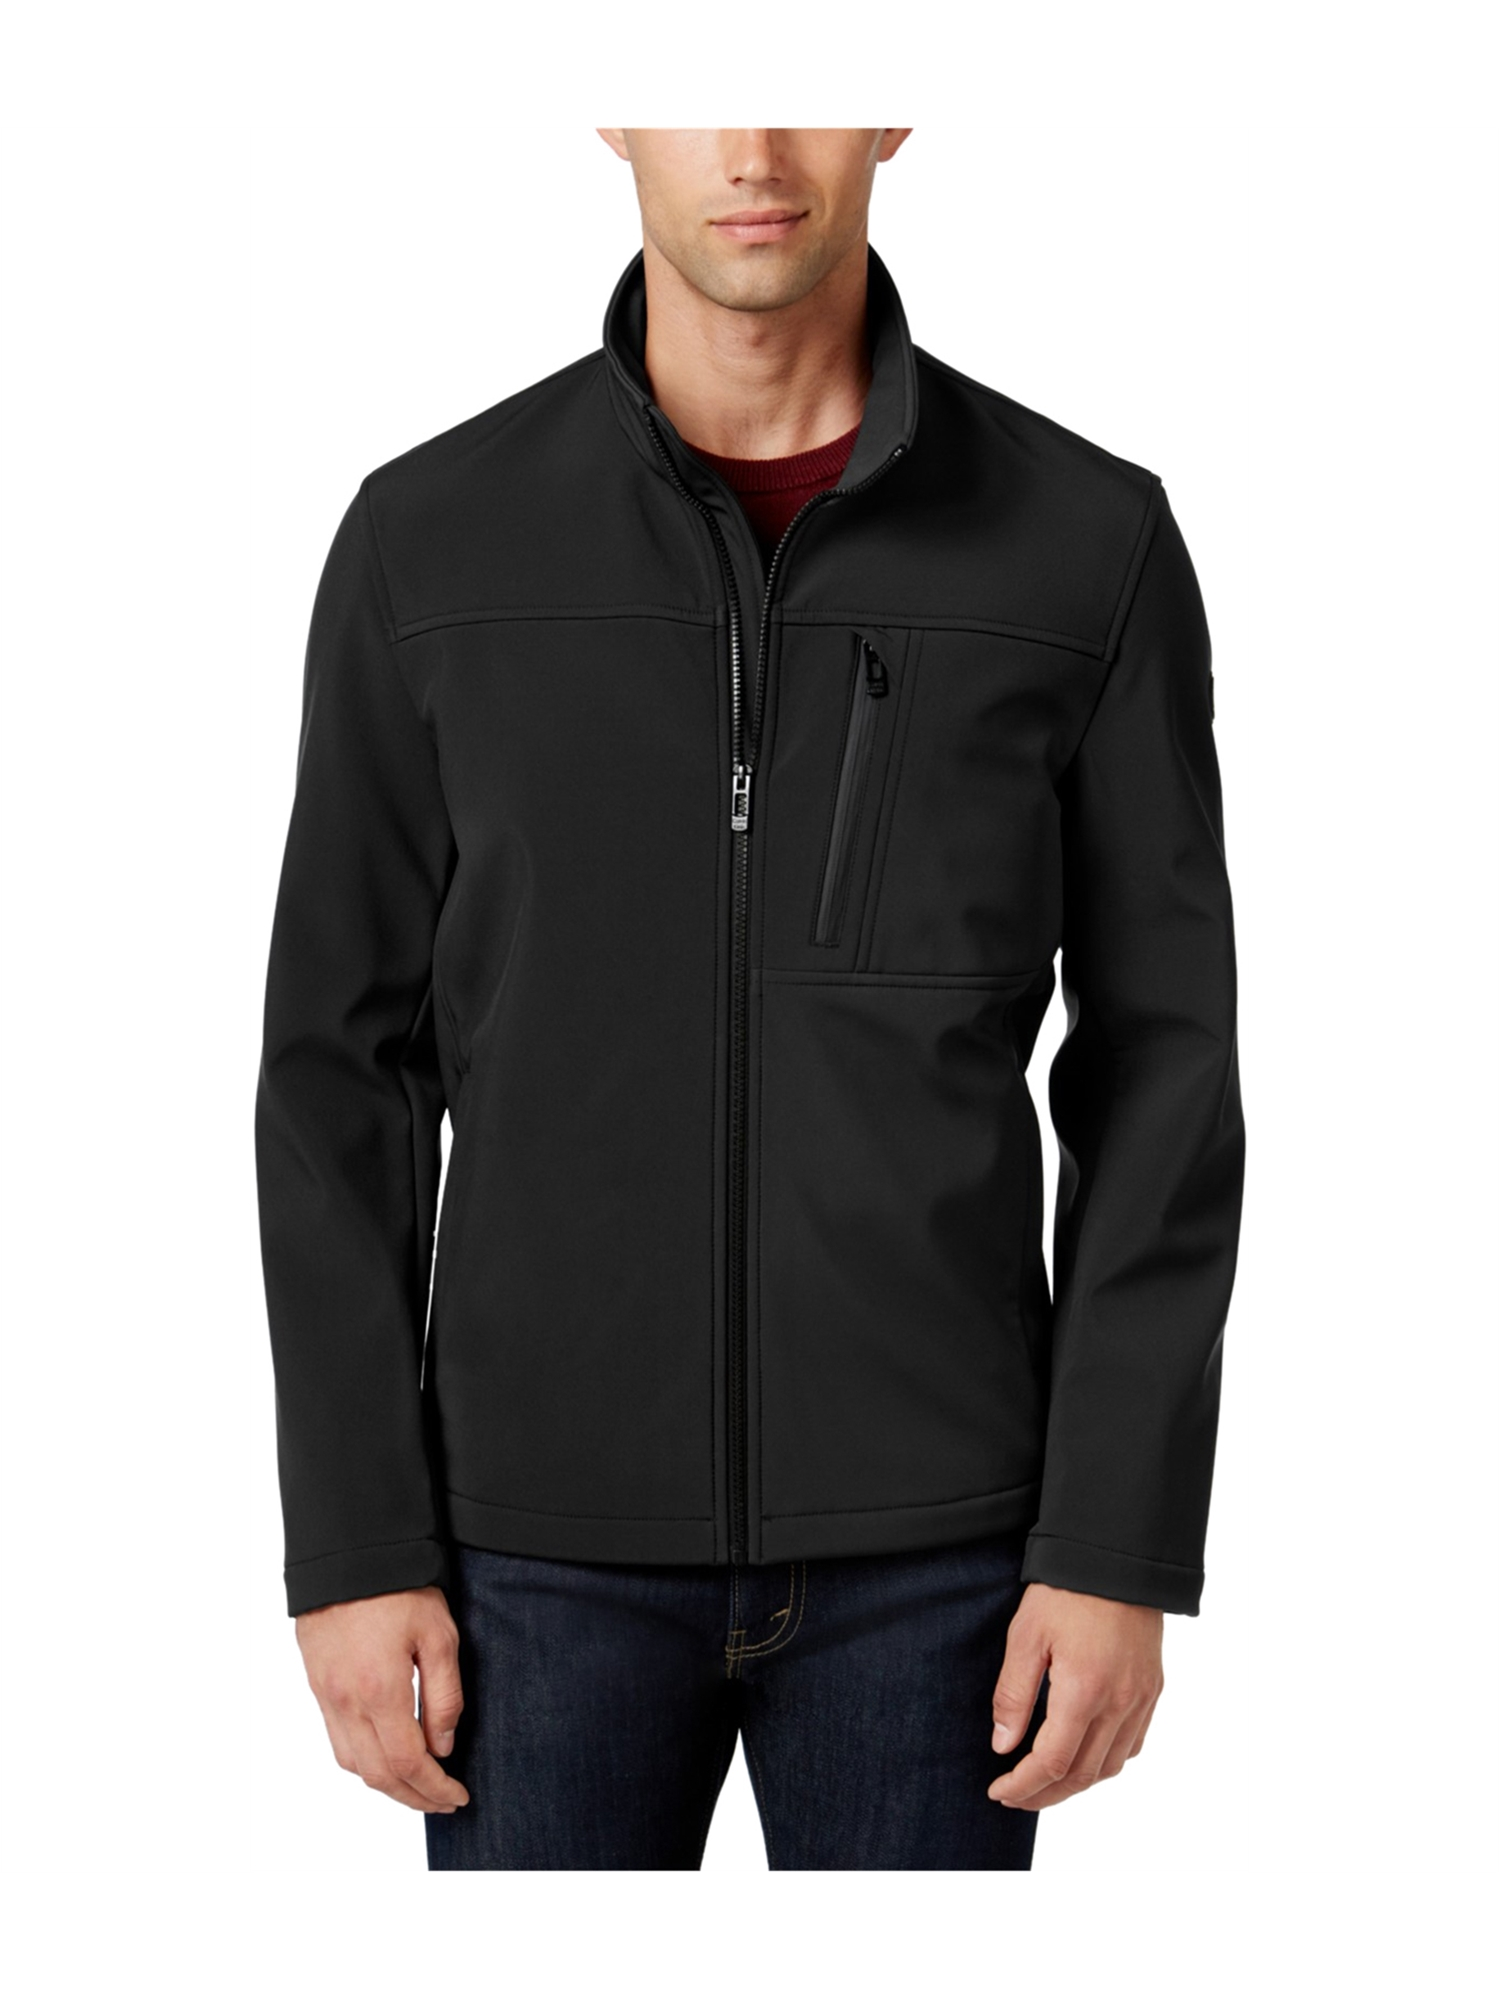 6714683a7ee Calvin Klein Mens Softshell Fleece Jacket blk LT - Big   Tall